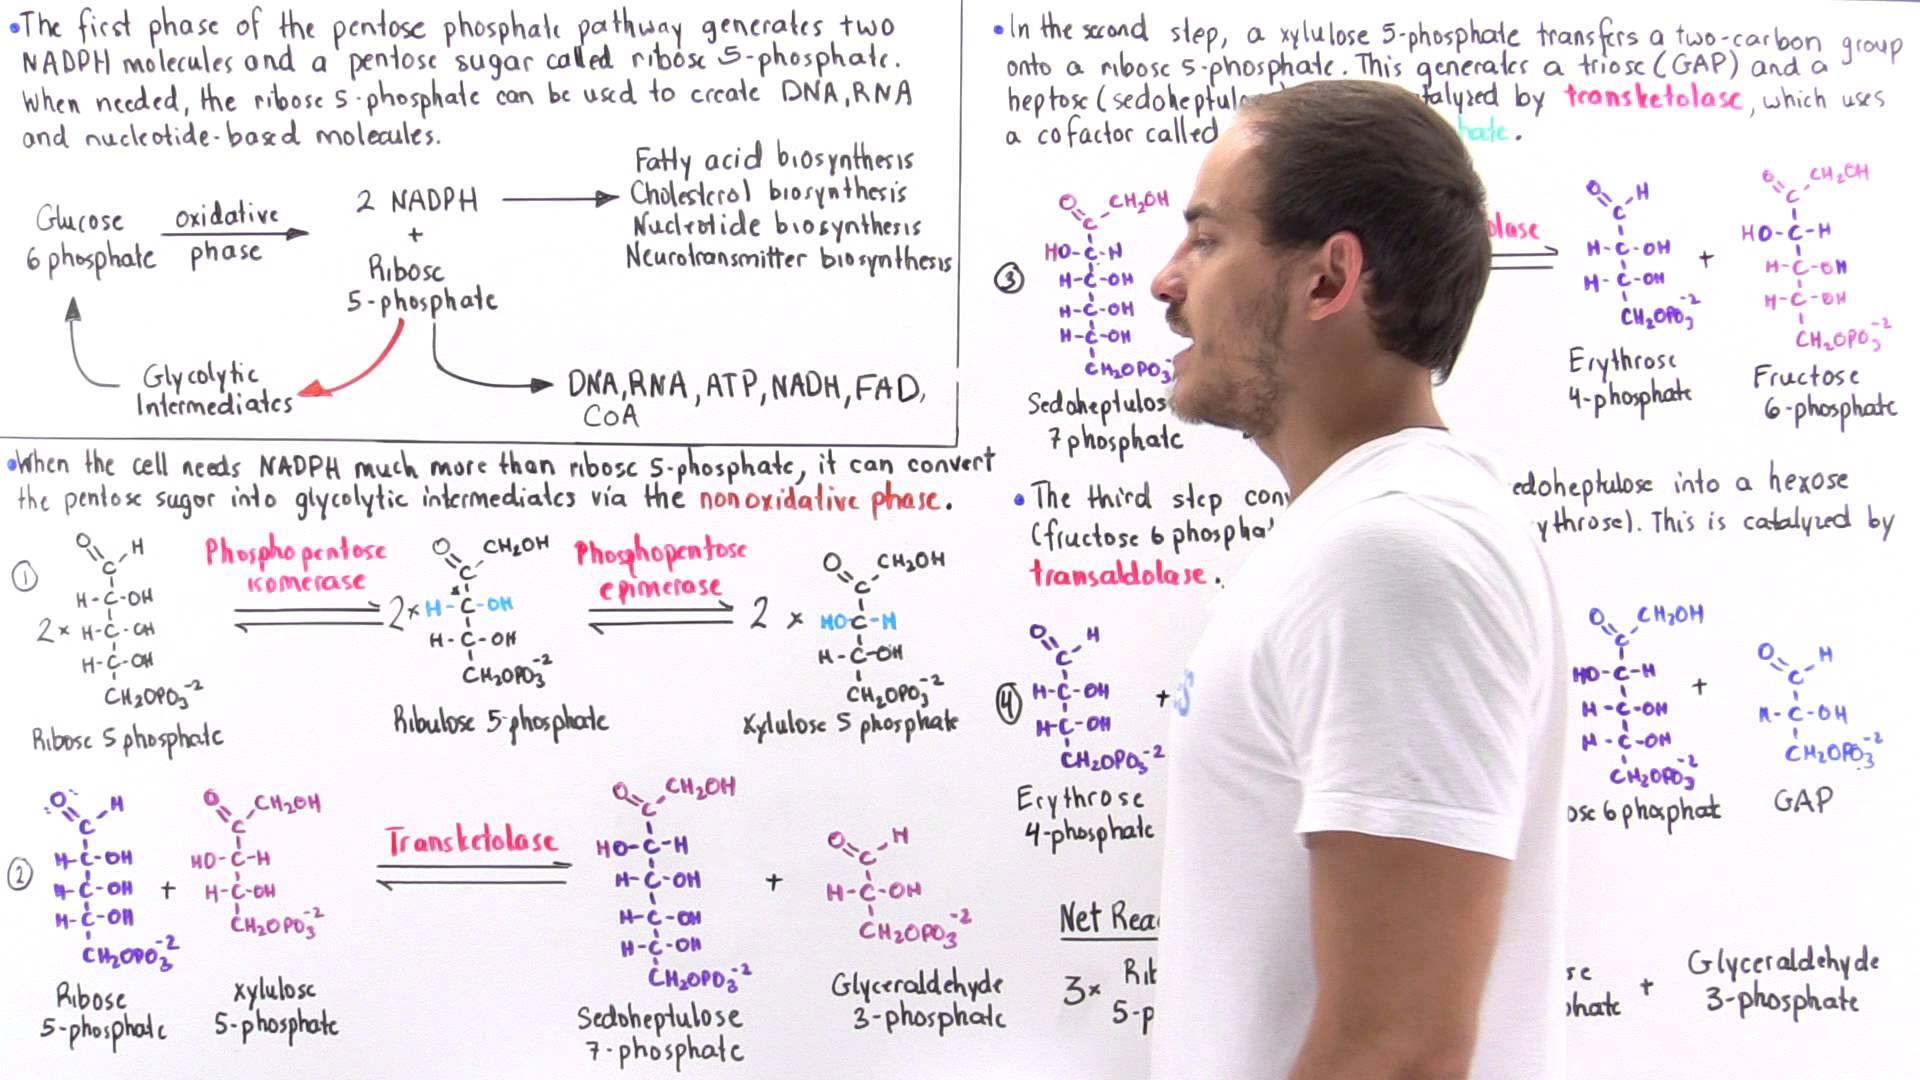 Nonoxidative Phase of Pentose Phosphate Pathway